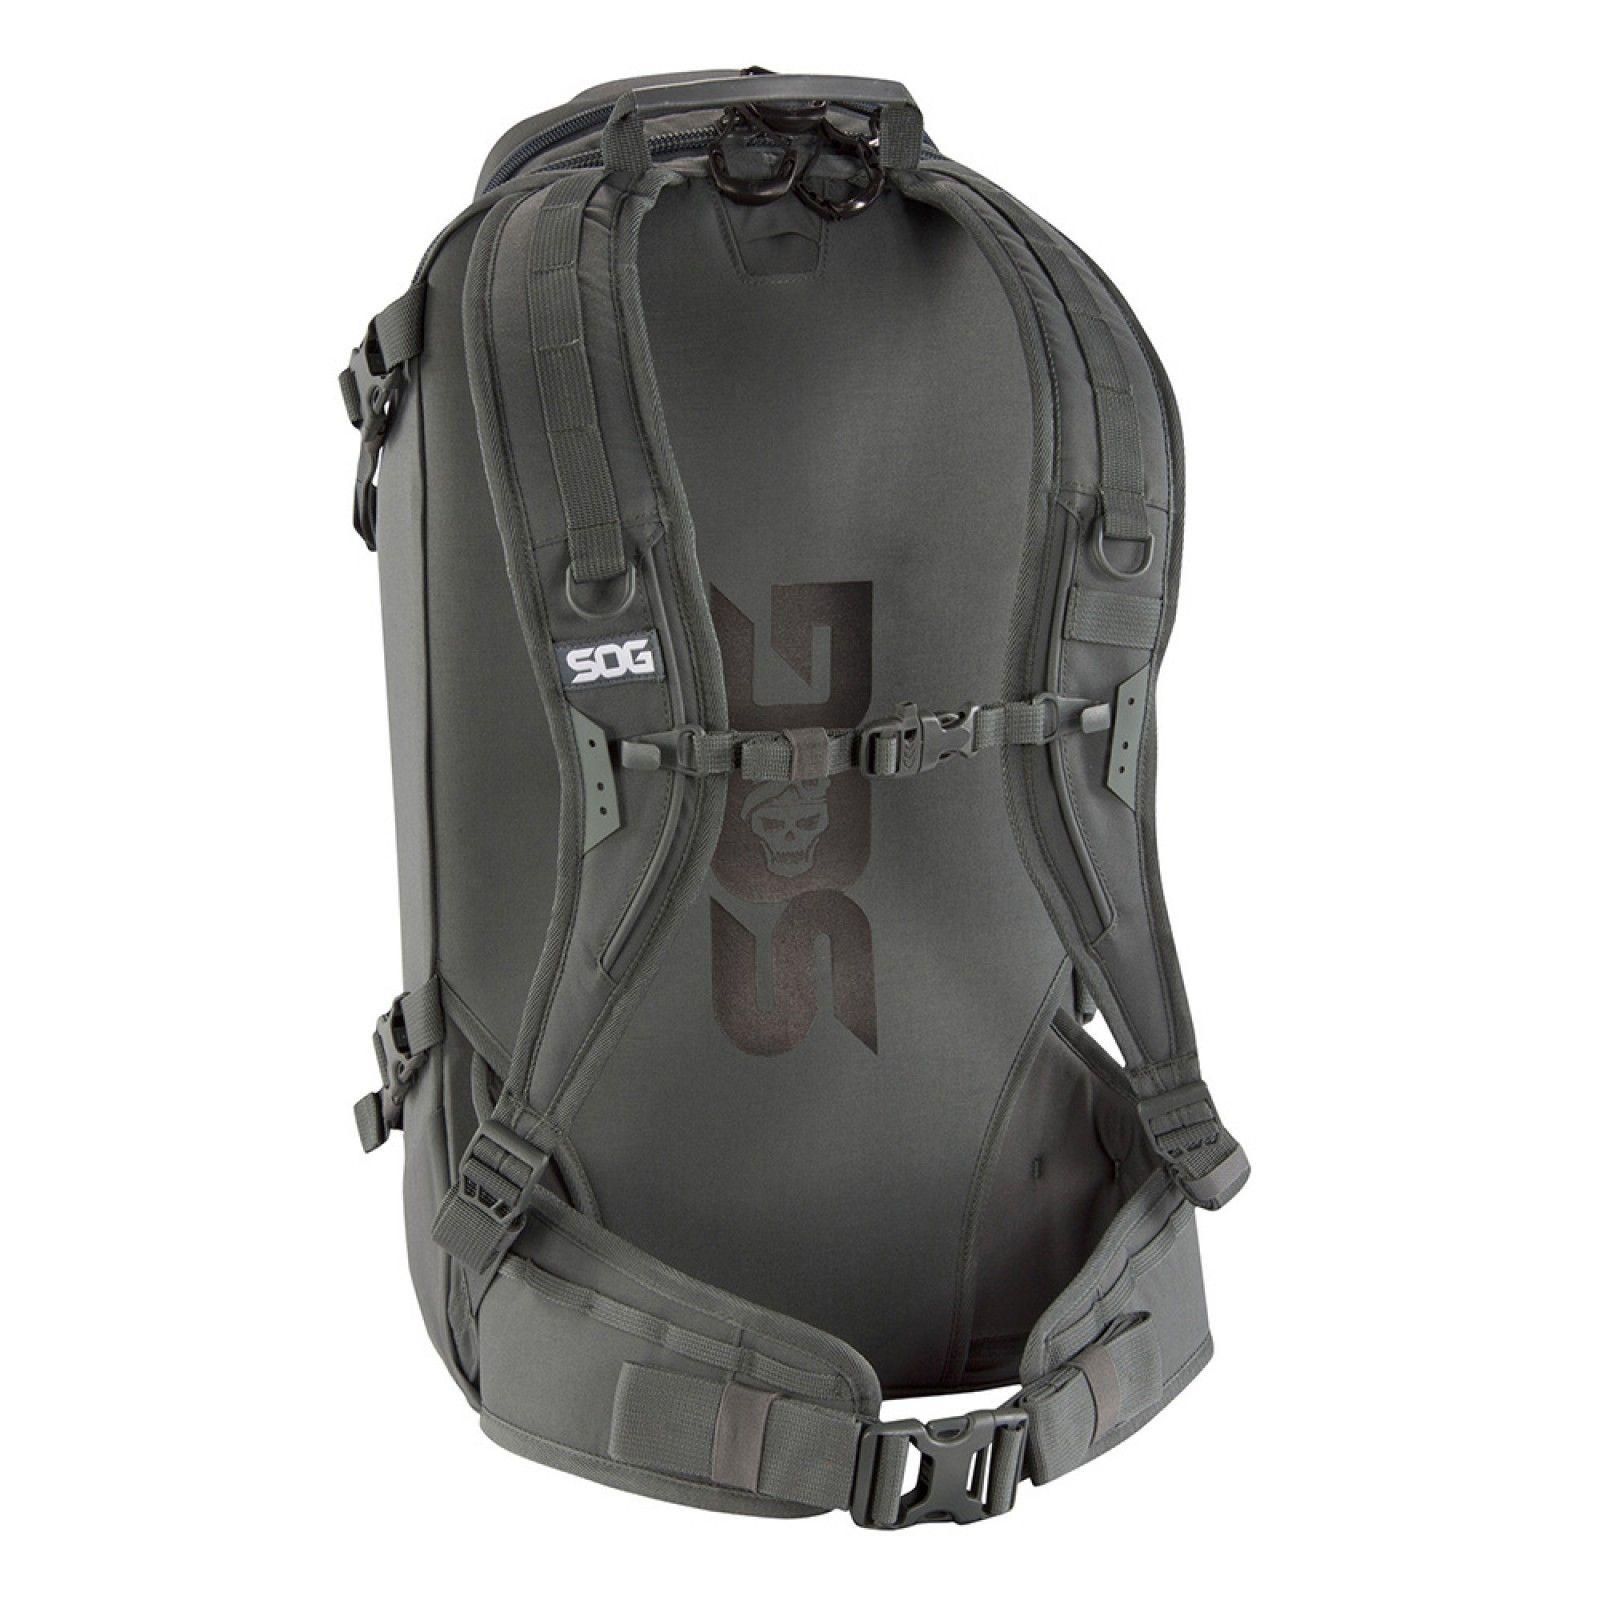 24l Army Bags - ebecc2dd6a69408c07c64d5393f7b983_Good 24l Army Bags - ebecc2dd6a69408c07c64d5393f7b983  Trends_532147.jpg